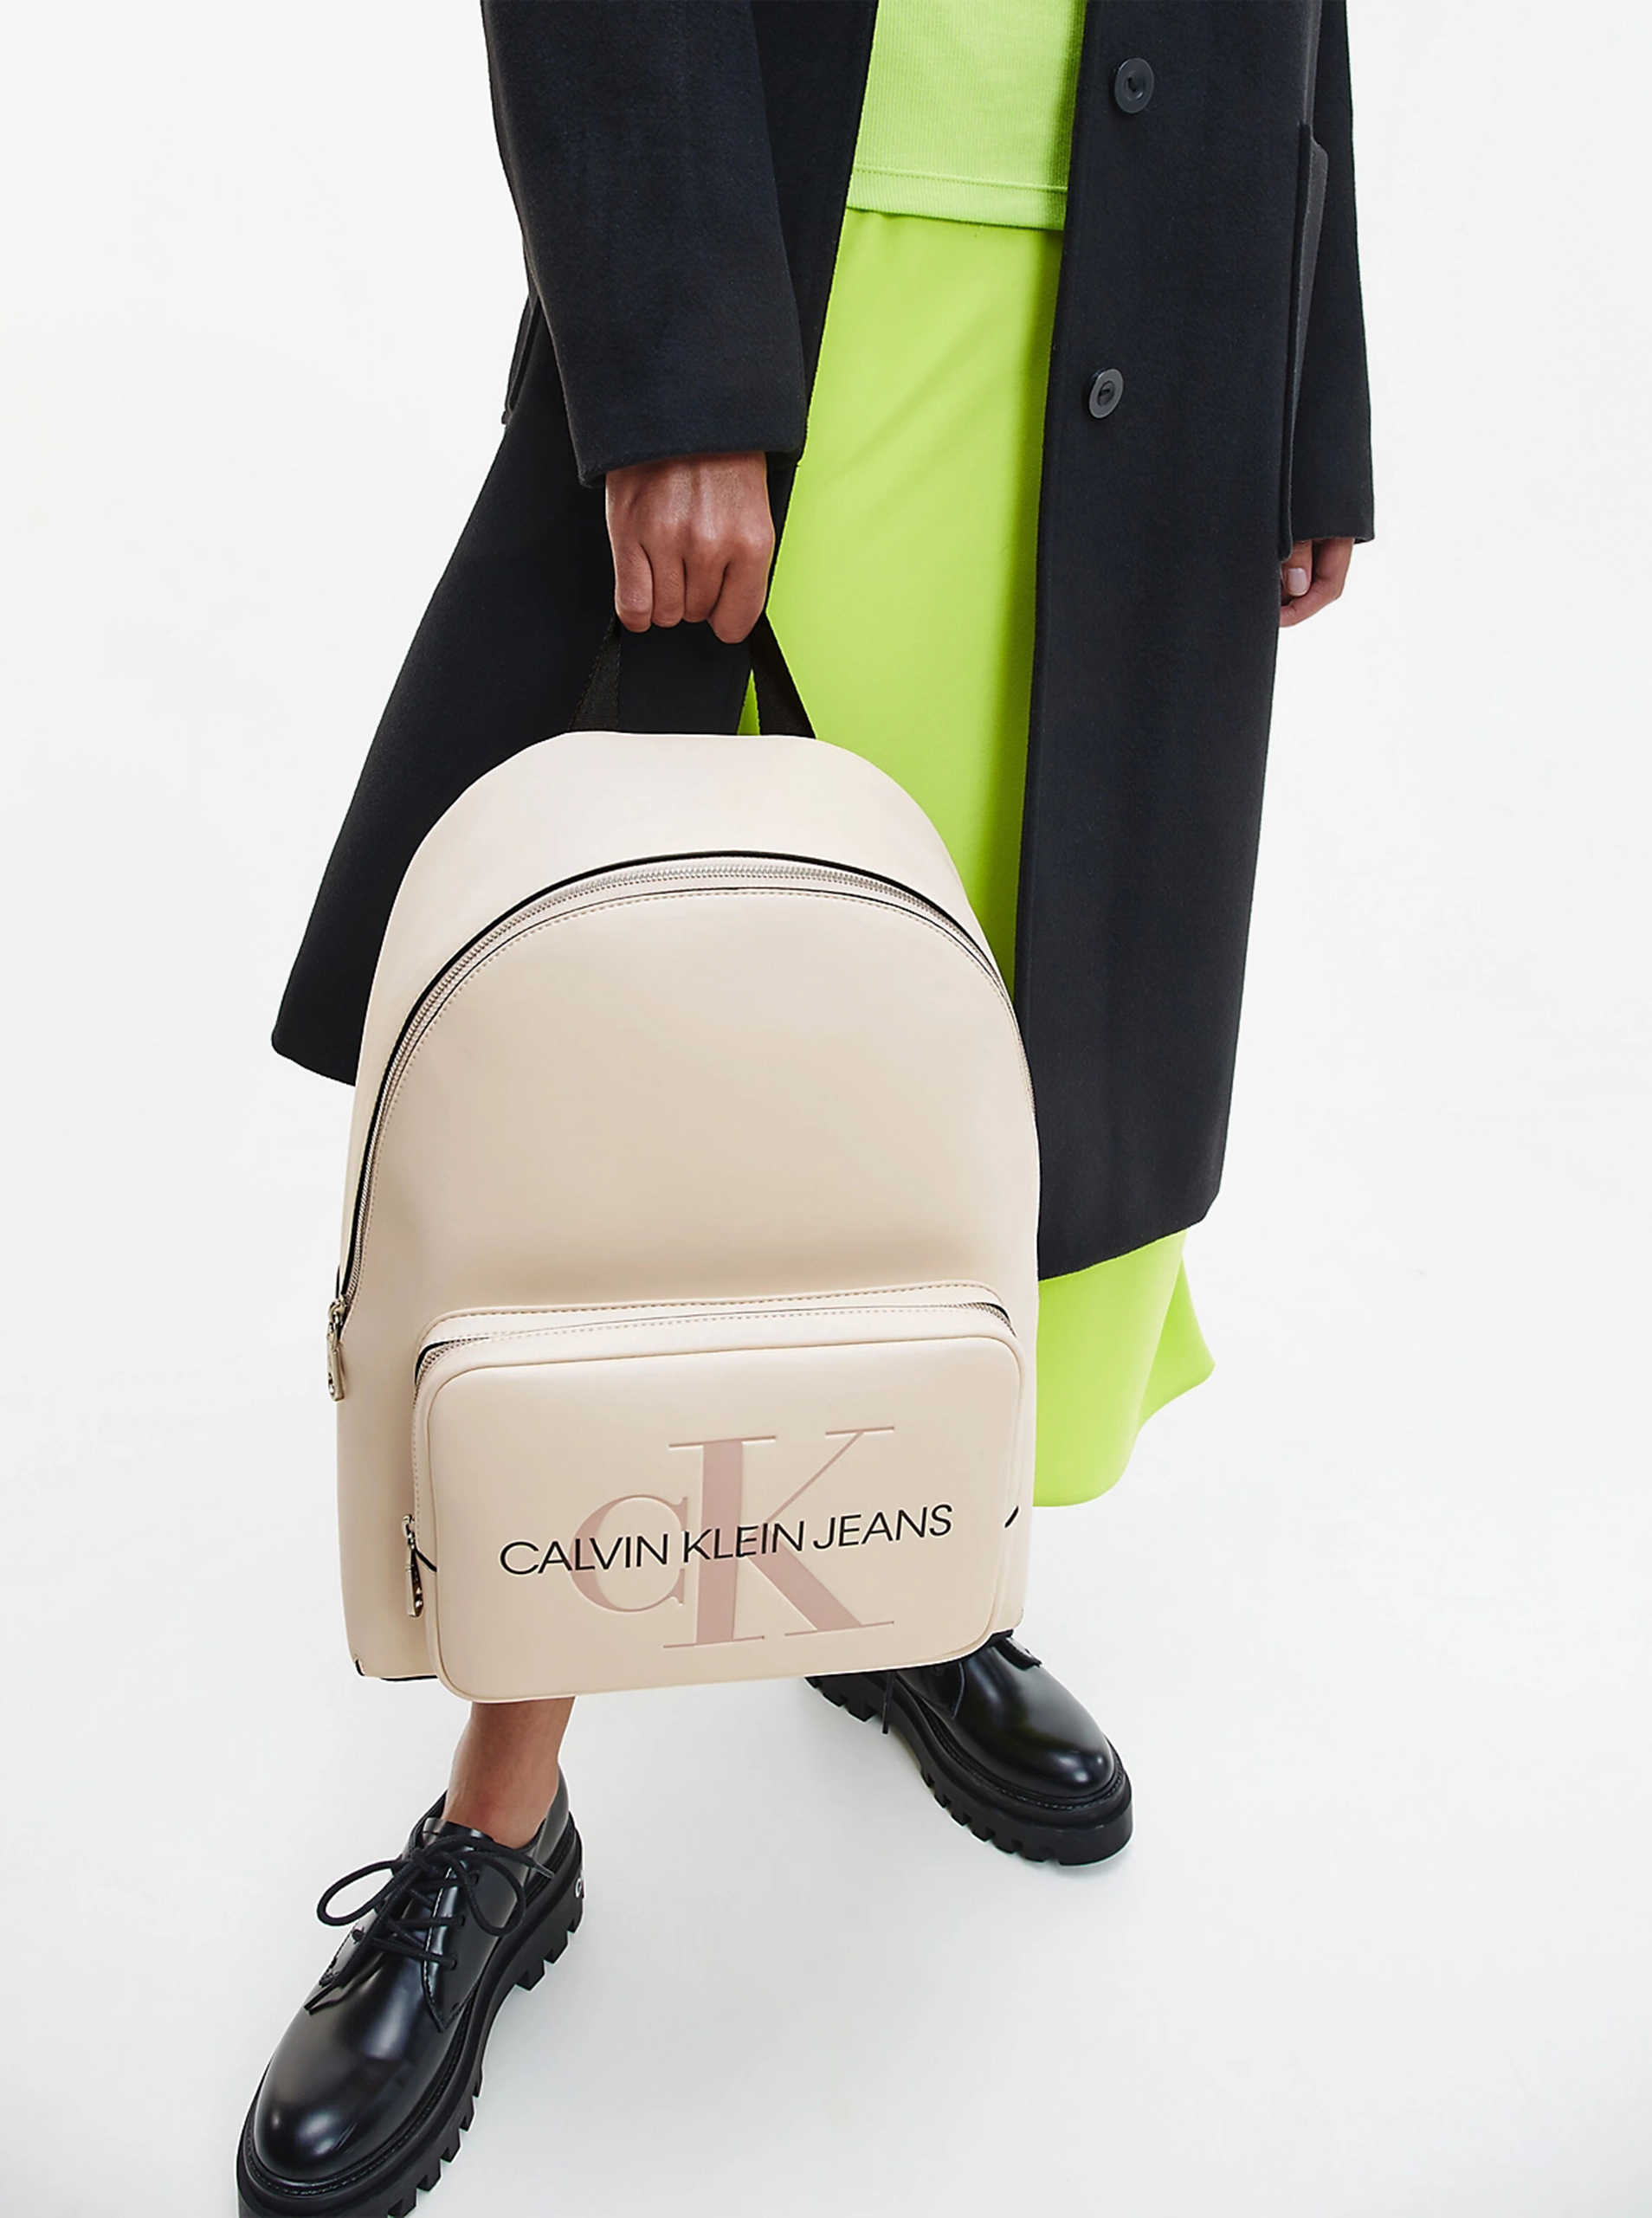 Calvin Klein smantanii/crem rucsac